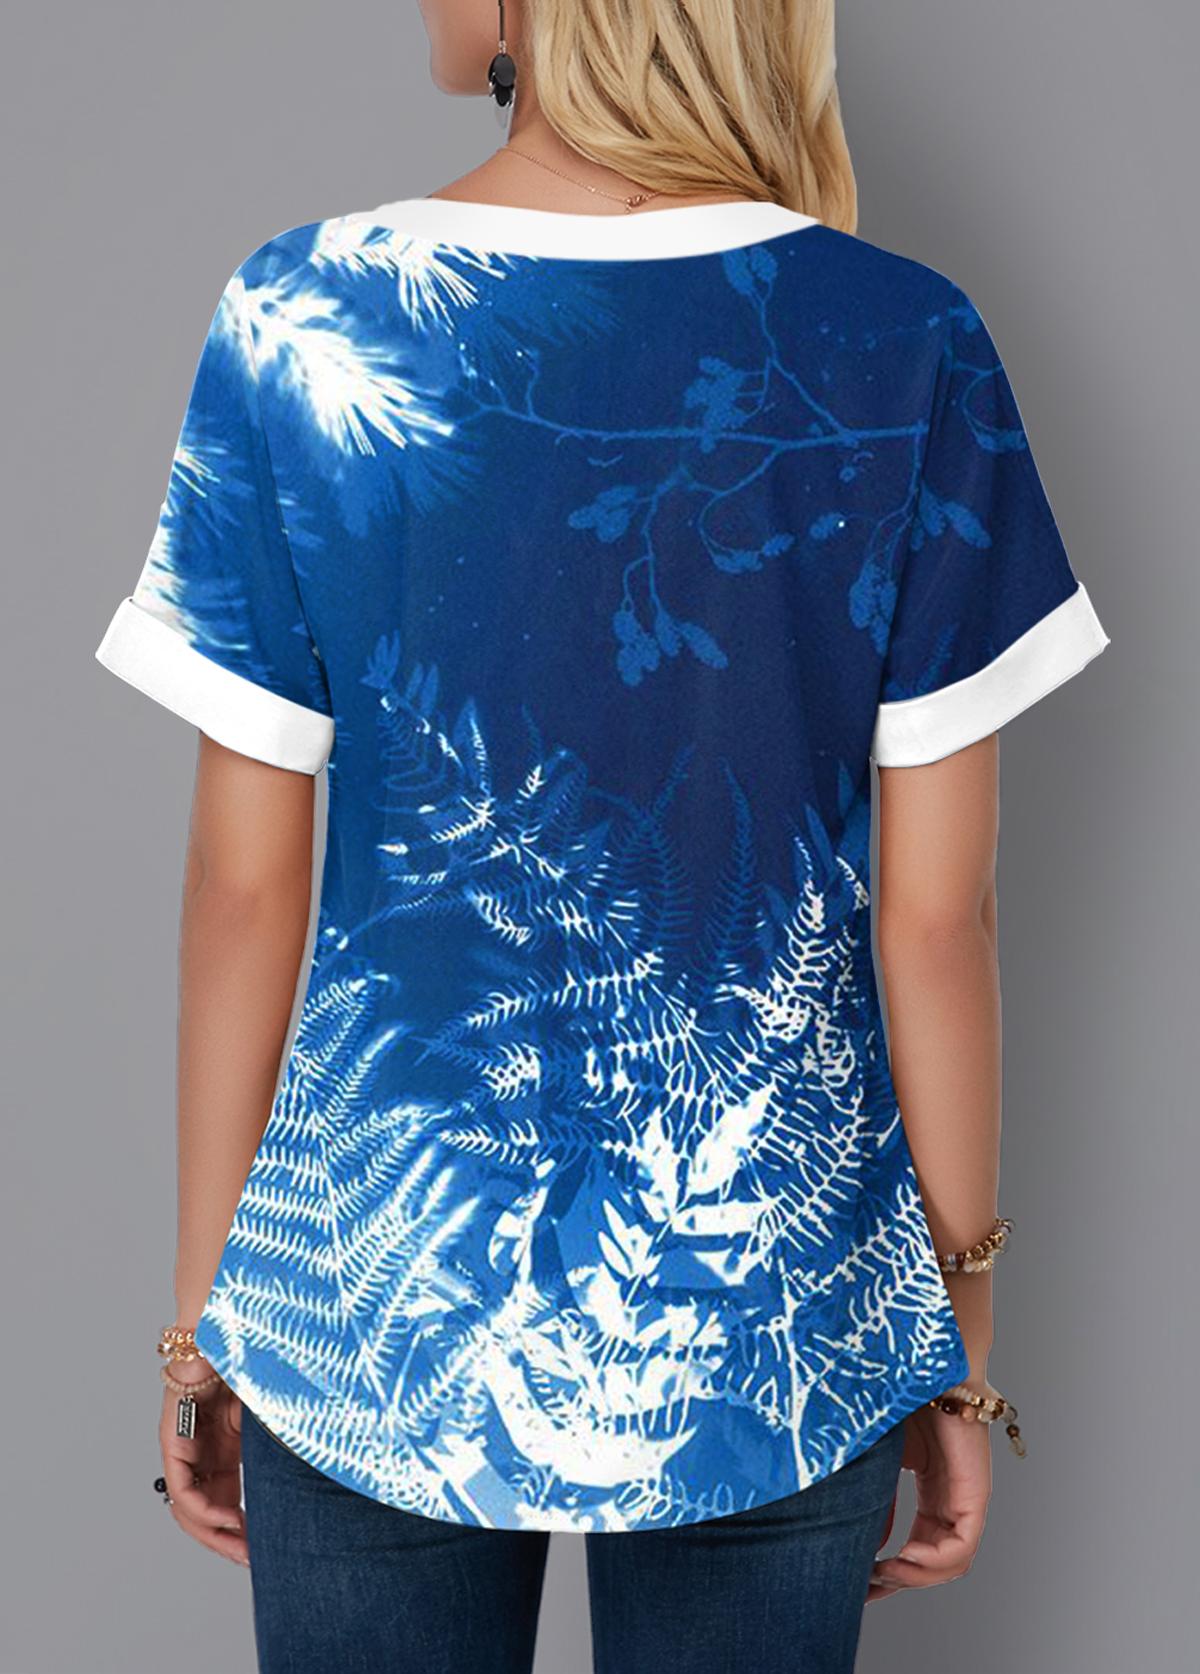 Lace Up Tie Dye Tropical Print Blouse